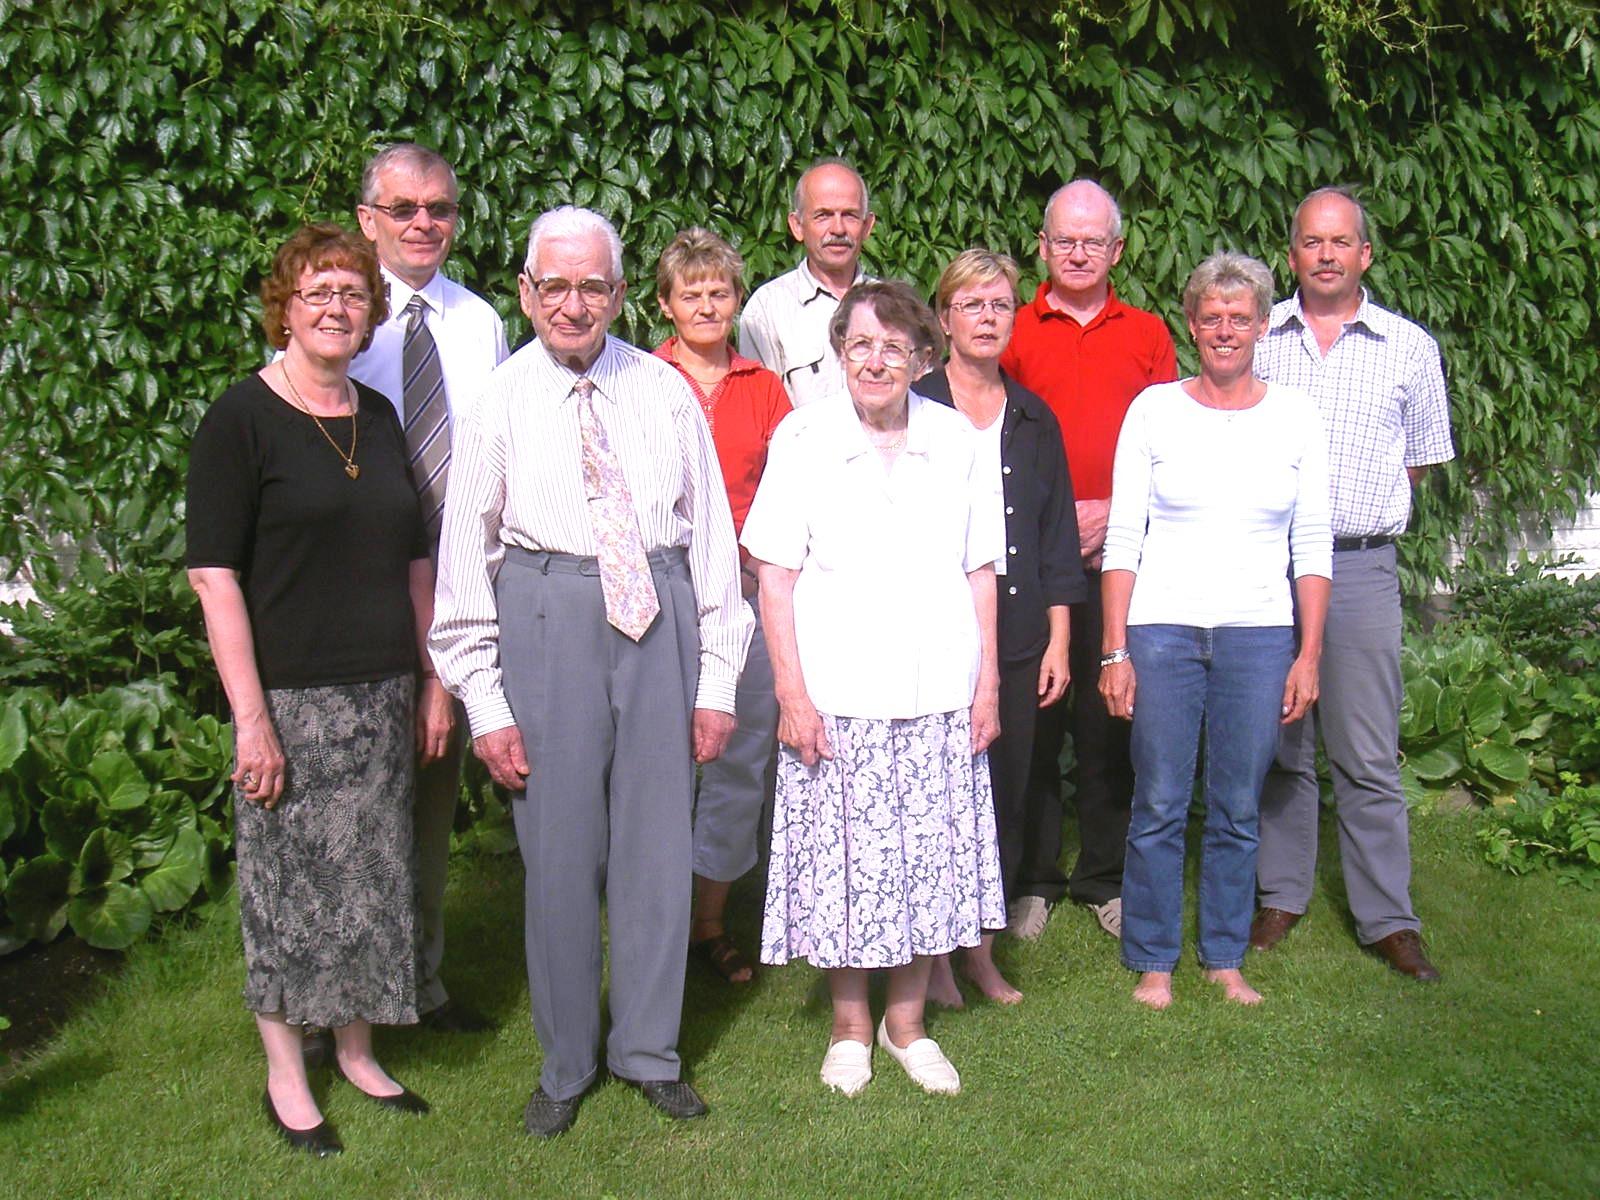 Thea, Per-Erik, Ragnar, Annel, John, Jenny, Reija, Kurt, Eva och Lasse sommaren 2005.